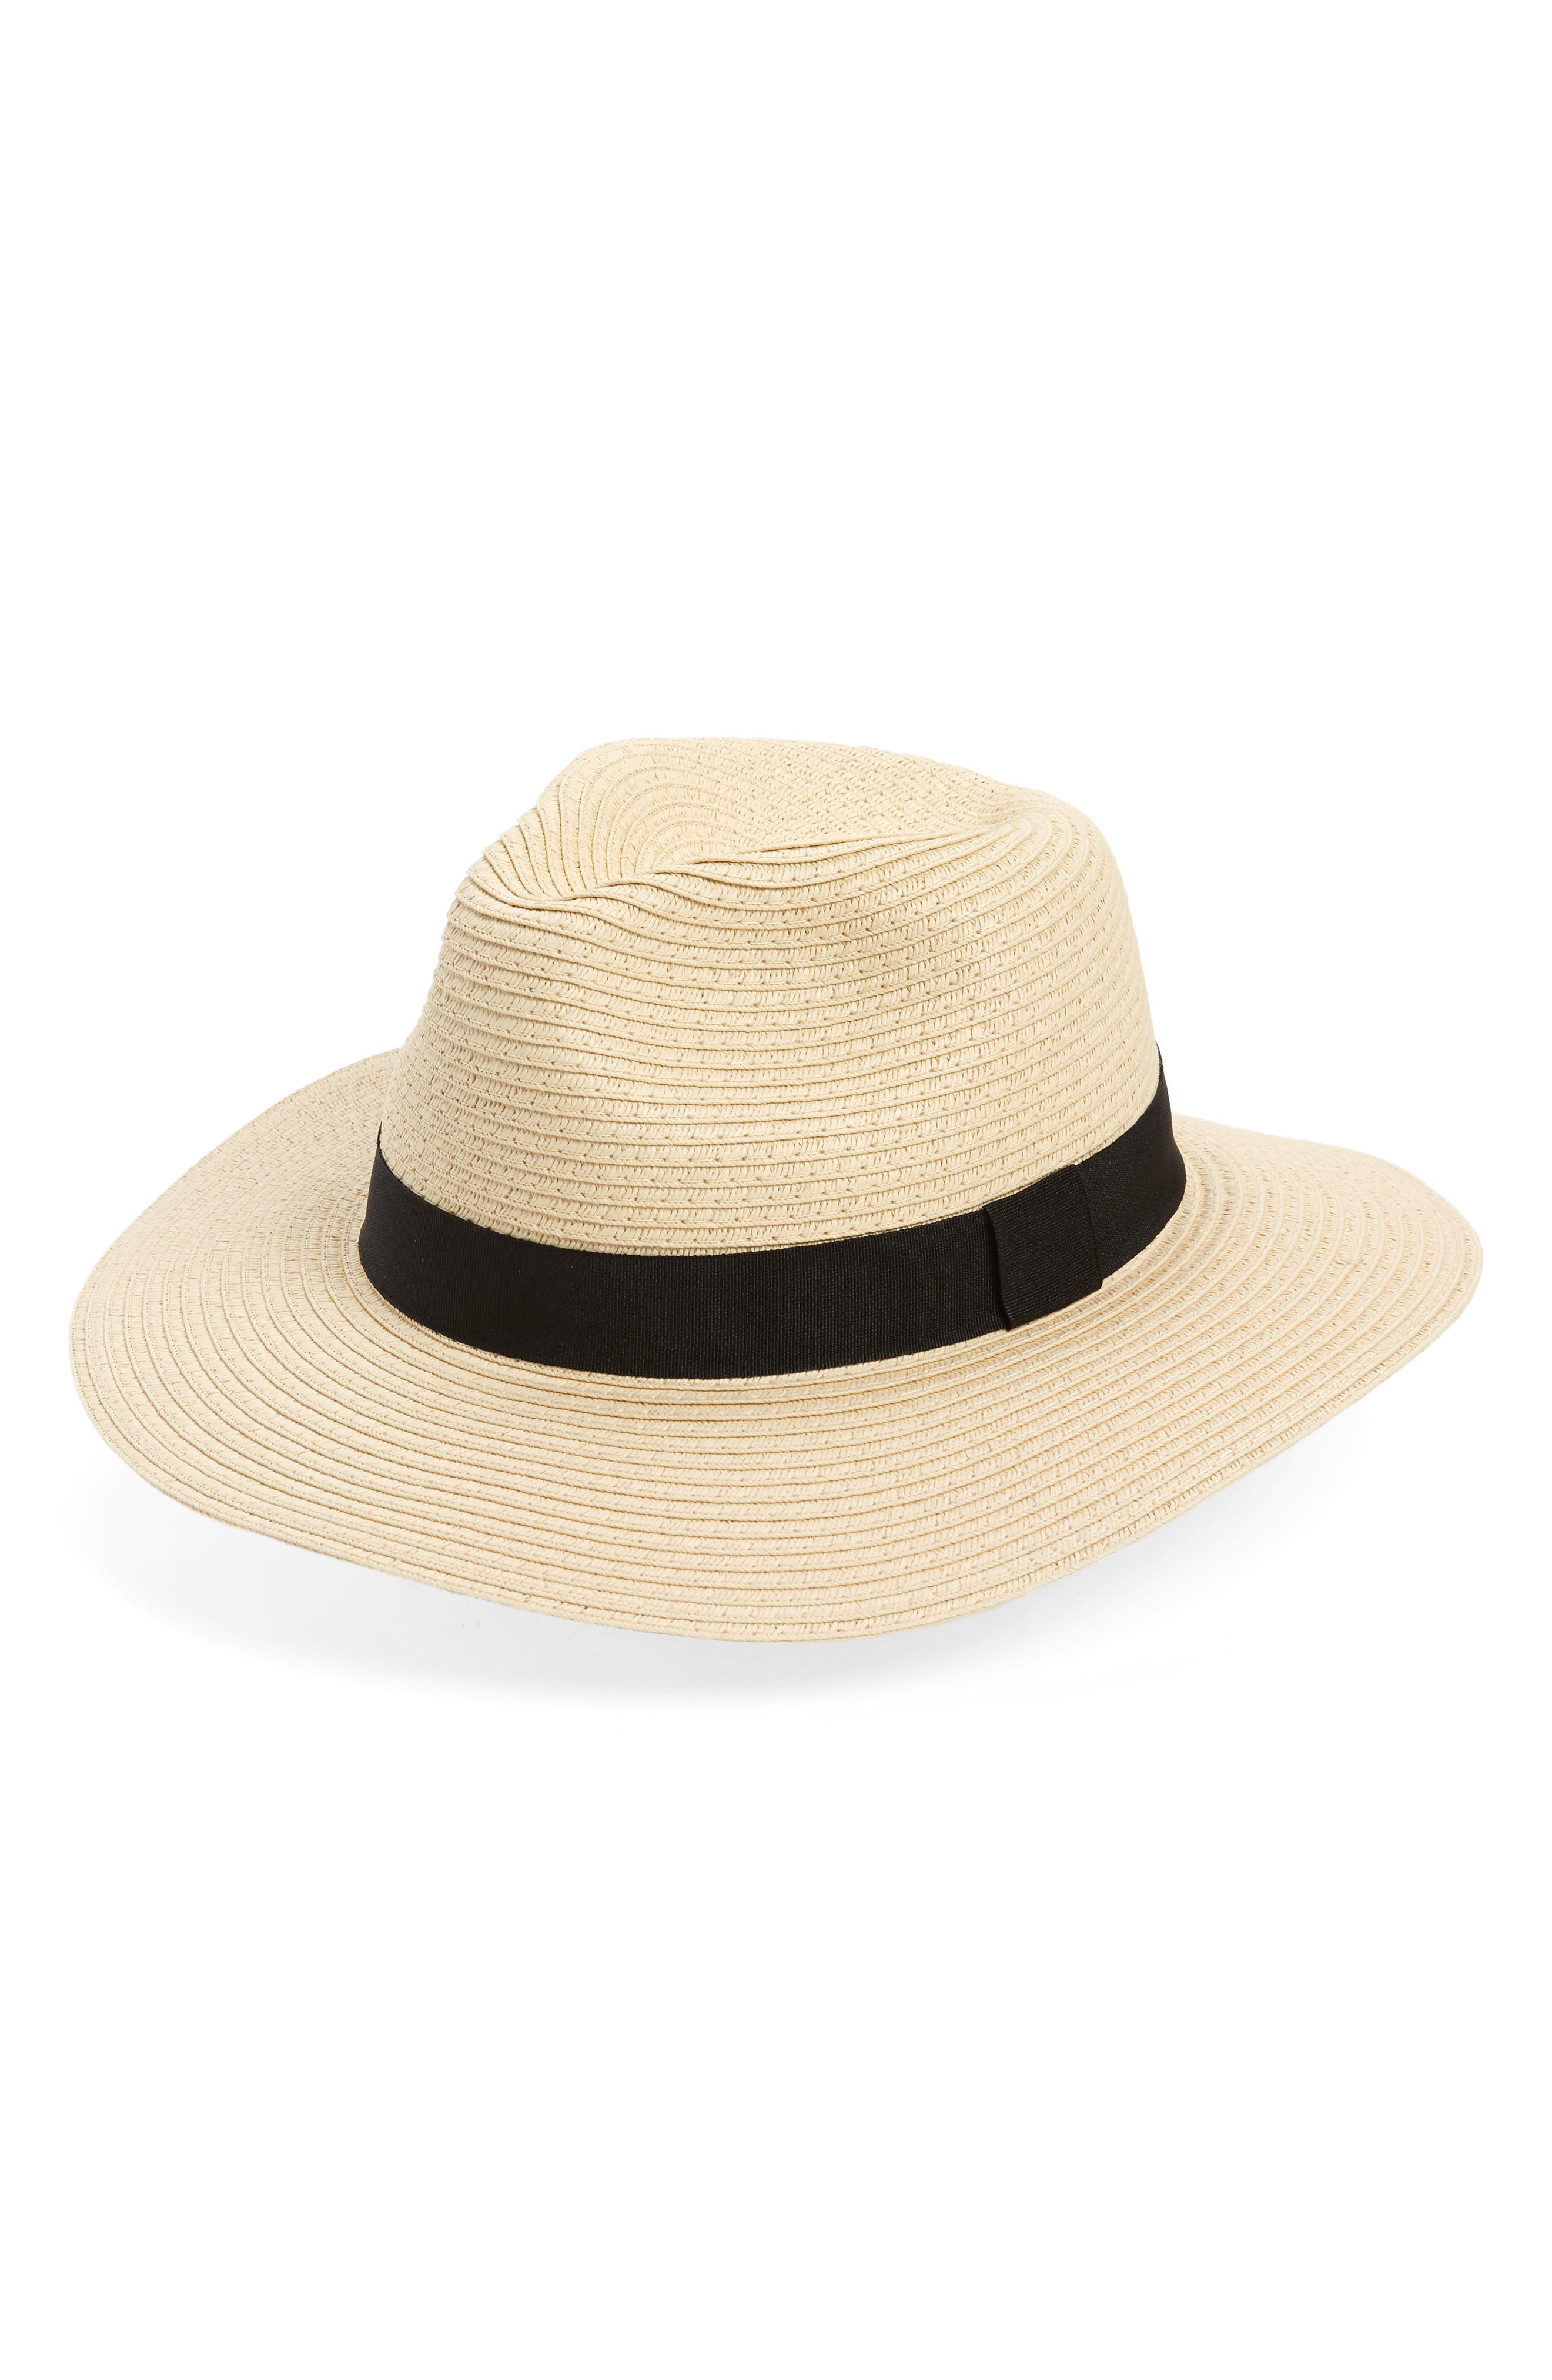 Sole Society Straw Panama Hat